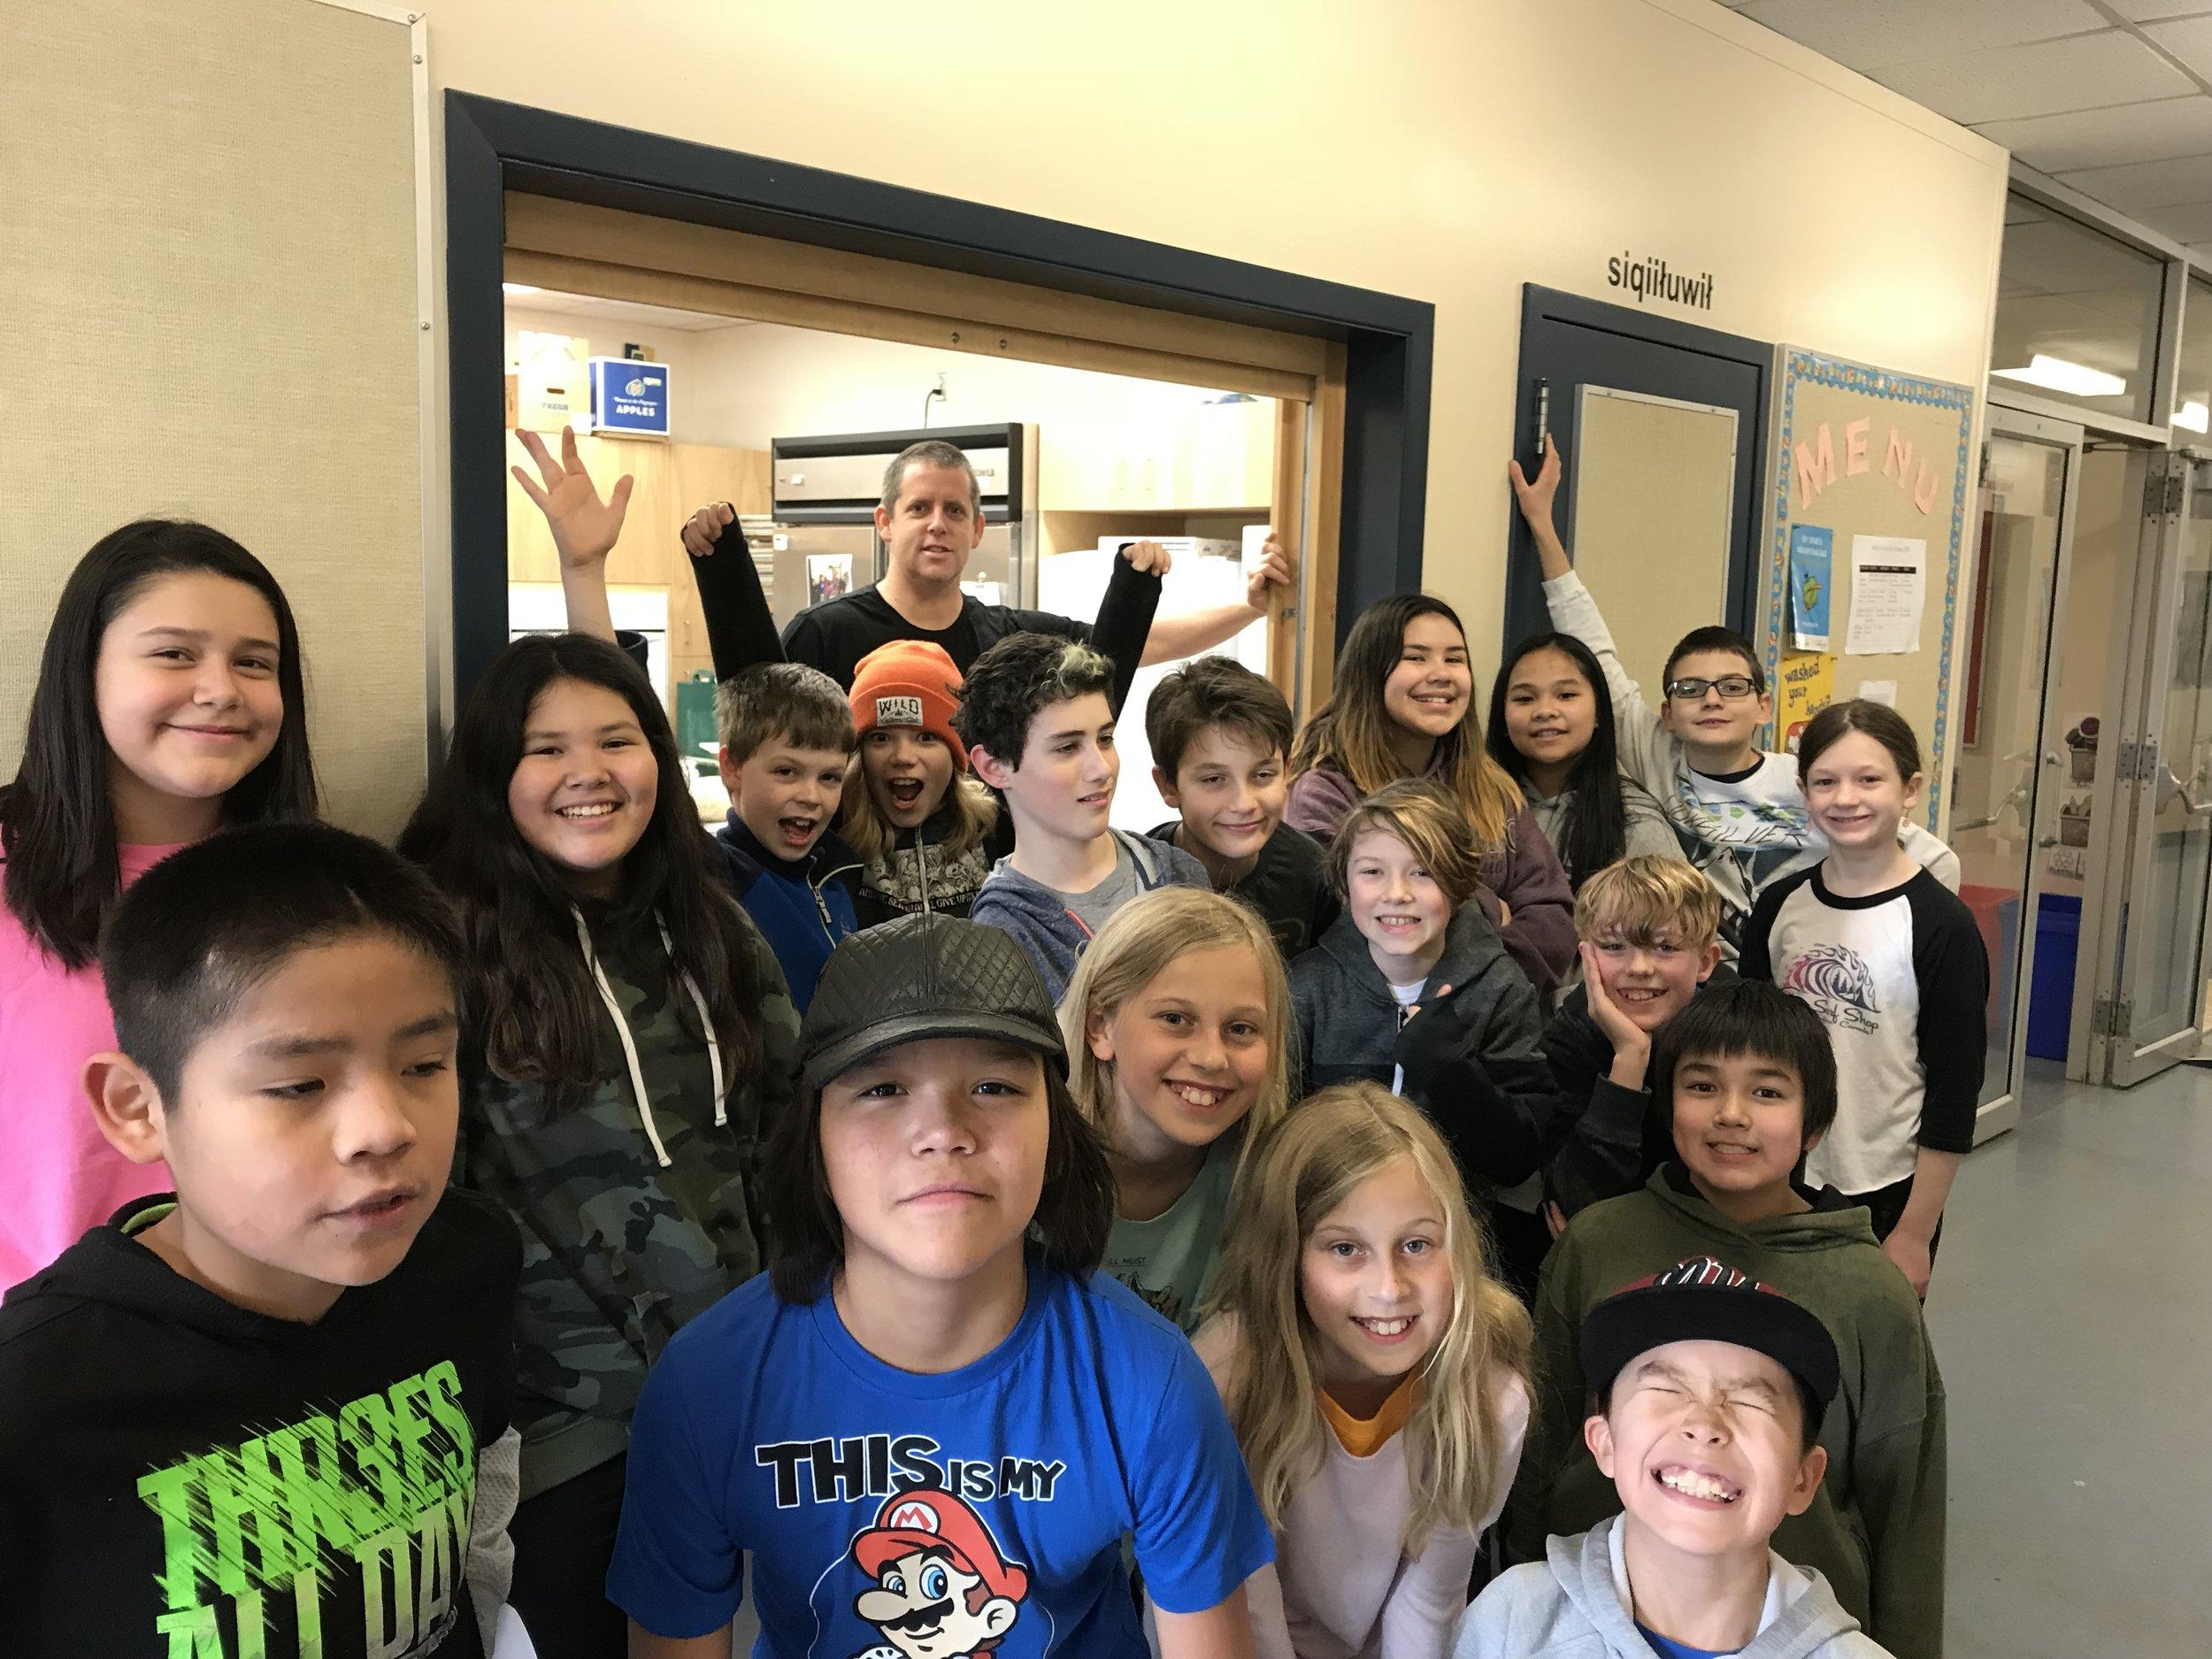 The Wickaninnish Community School